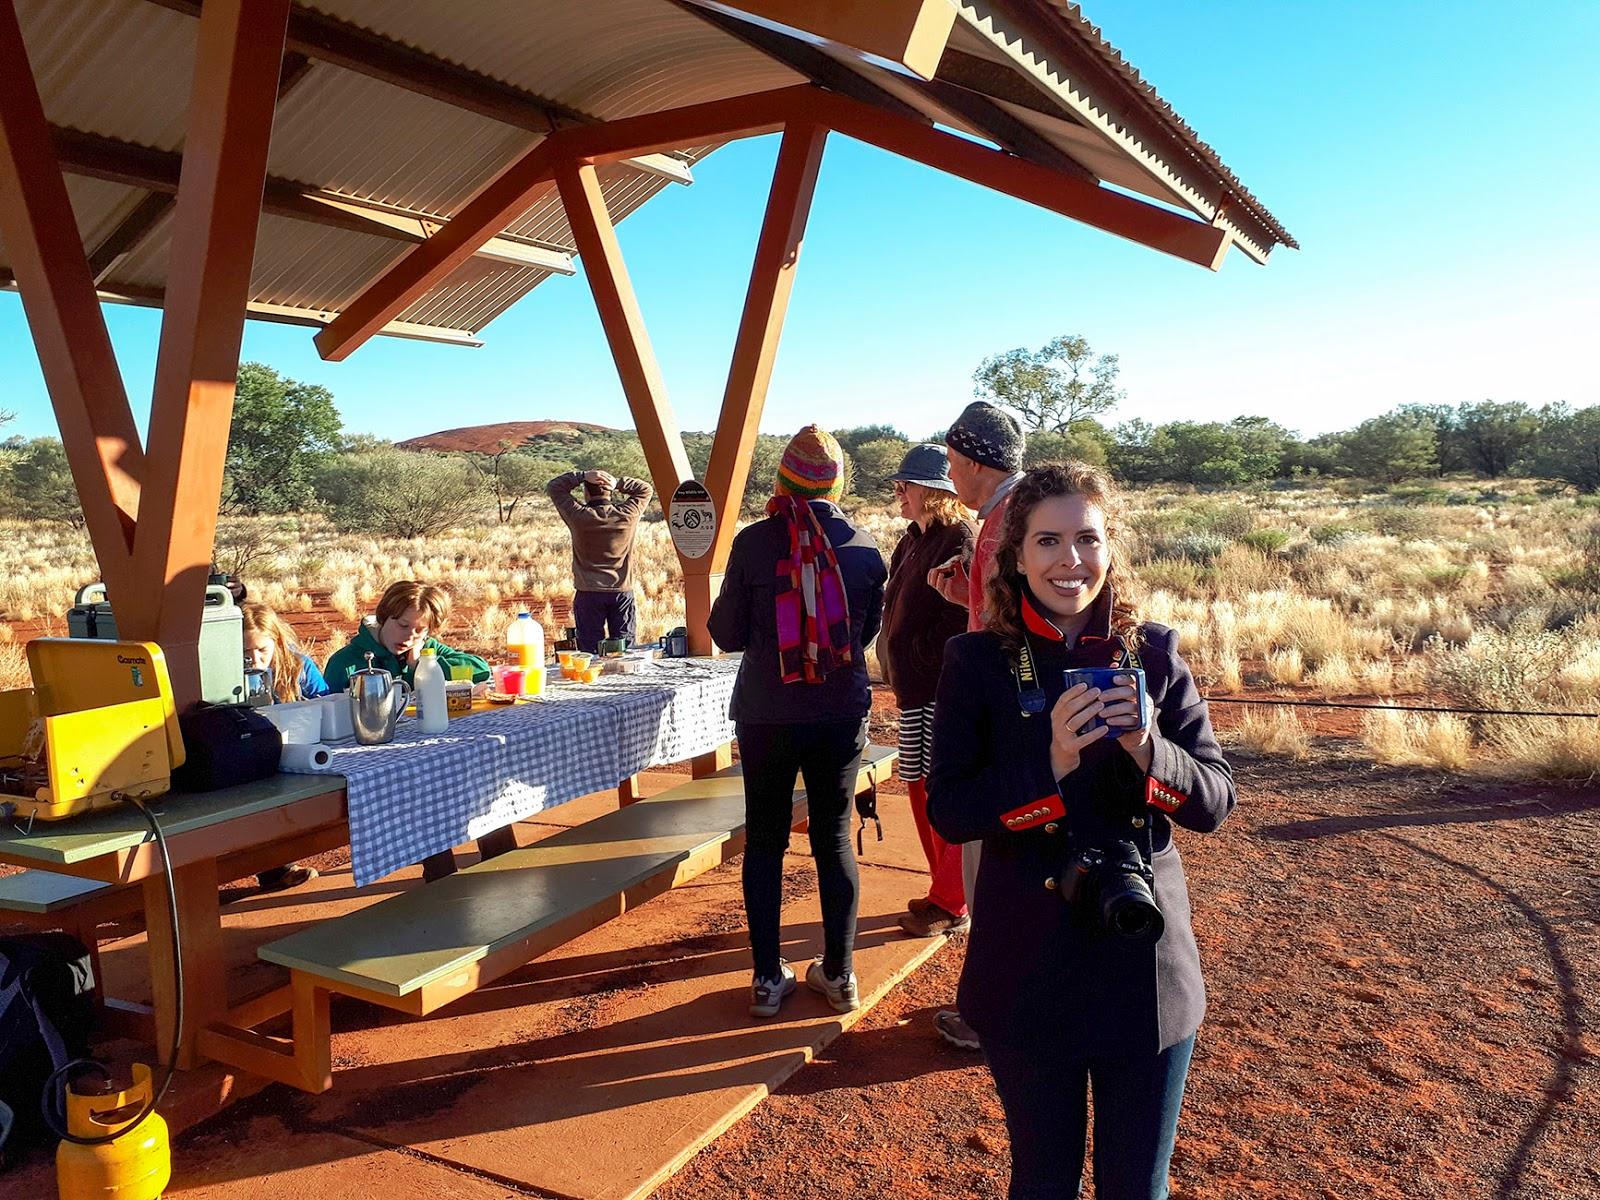 uluru australia outback kata-tjuta breakfast picnic